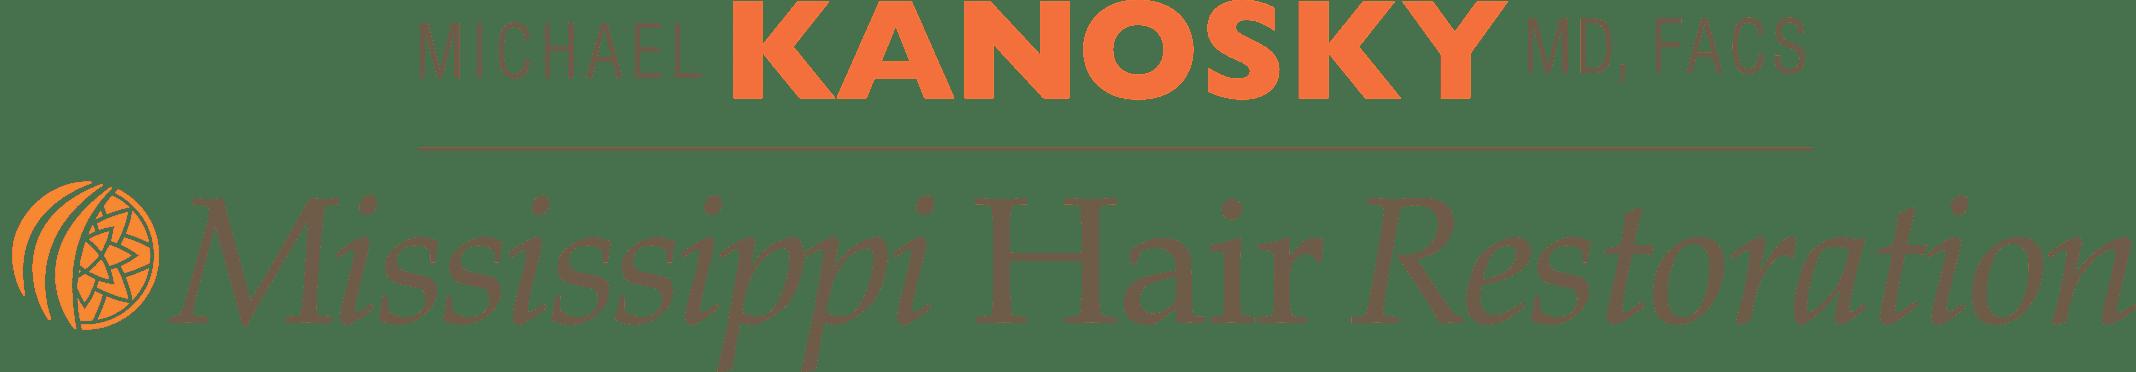 Kanosky Mississippi Hair Restoration